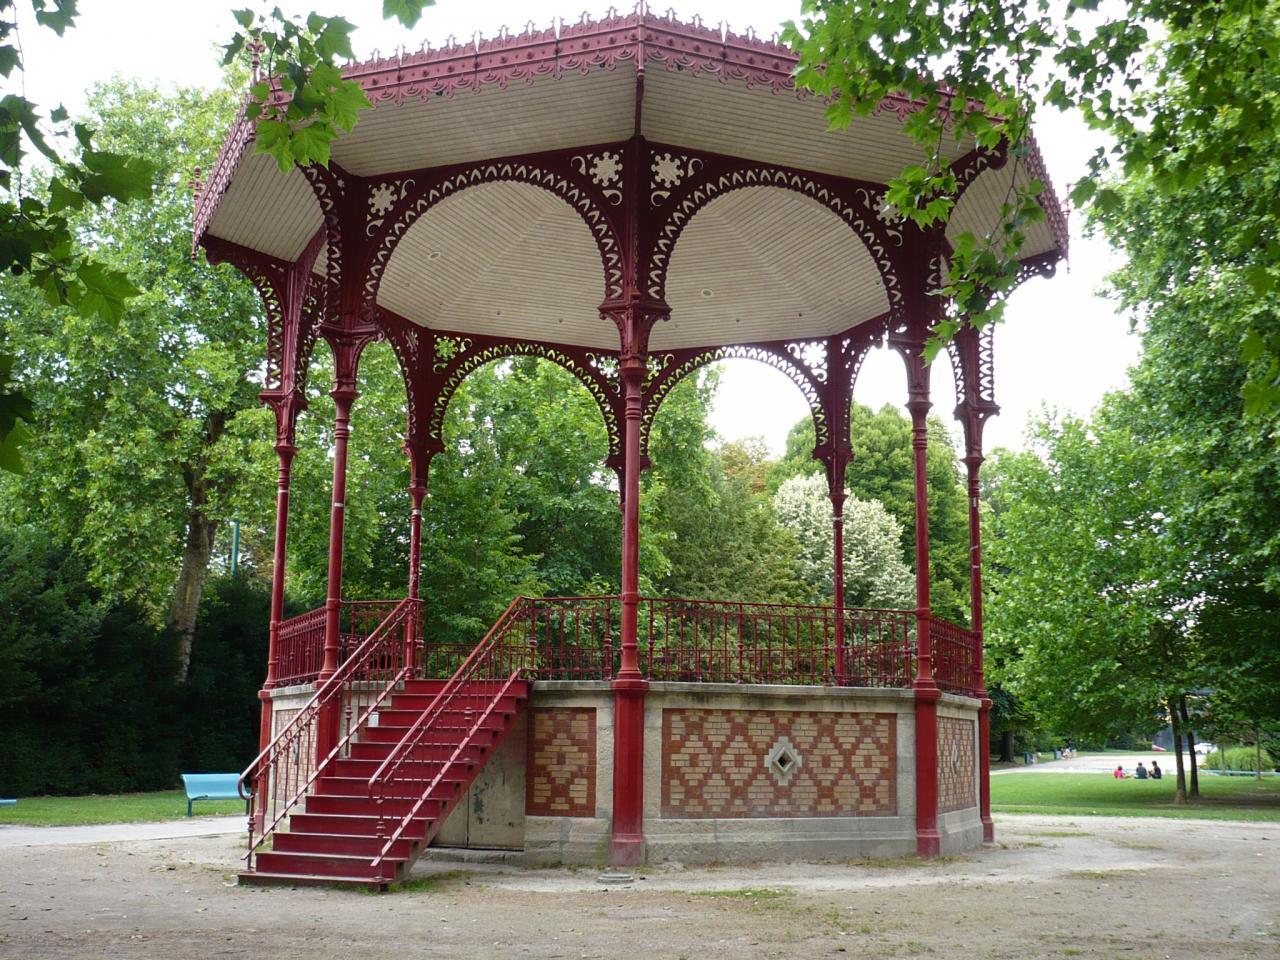 Abris De Jardin: Kiosque De Jardin Fermé avec Kiosque De Jardin En Bois Pas Cher